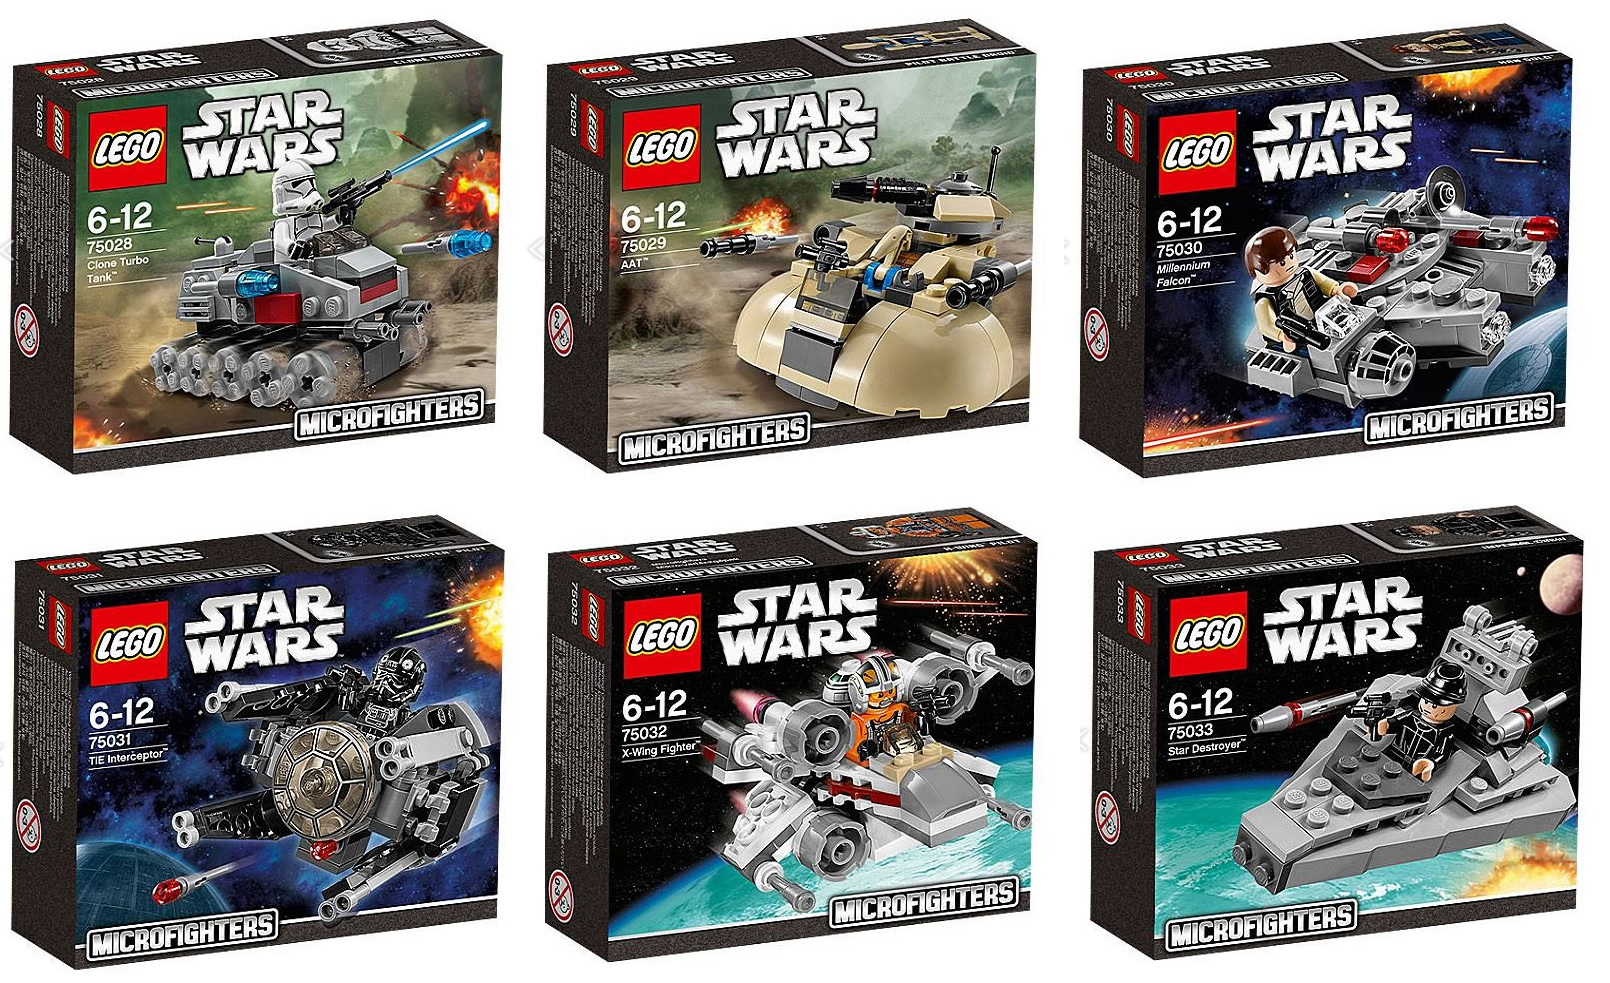 lego star wars microfighters des minisets lego et un jeu vid o guide du parent galactique. Black Bedroom Furniture Sets. Home Design Ideas